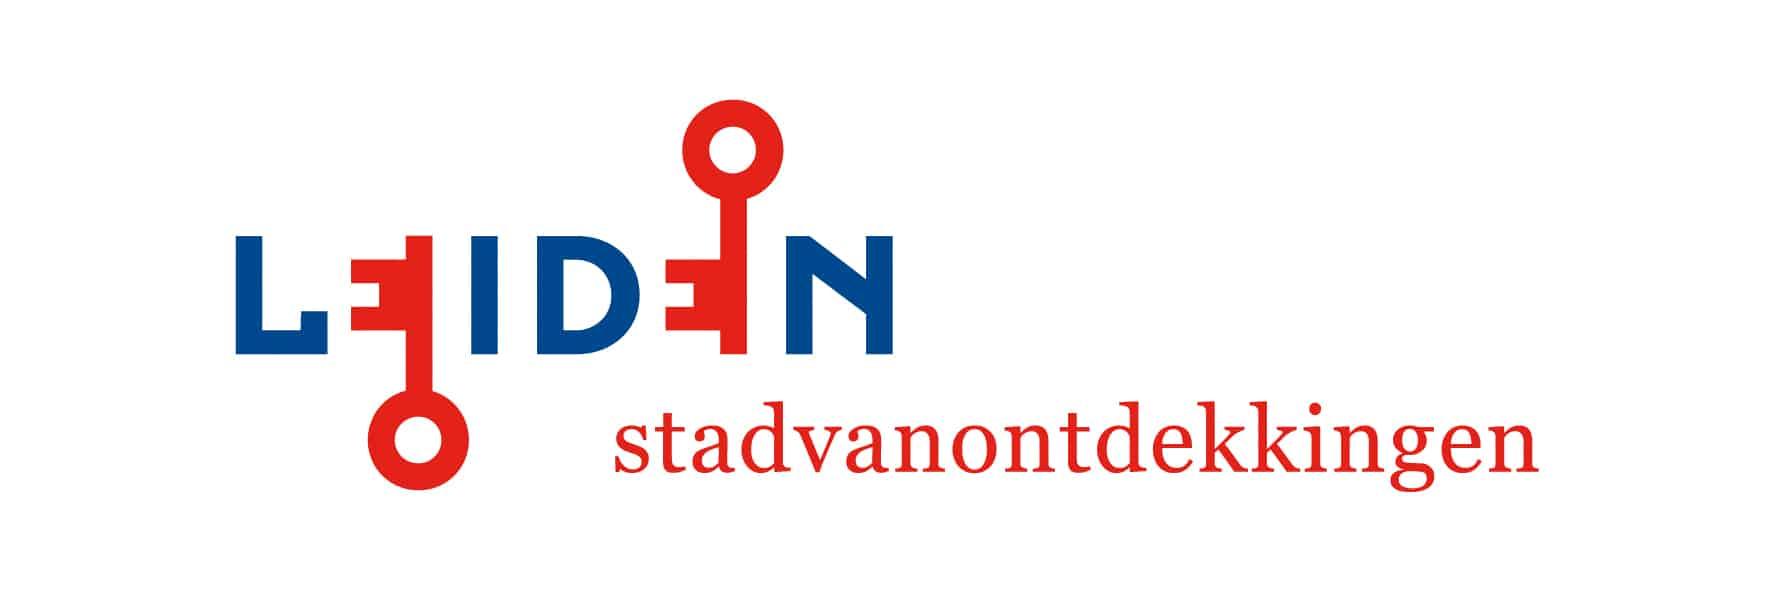 Groepsarrangementen Leiden